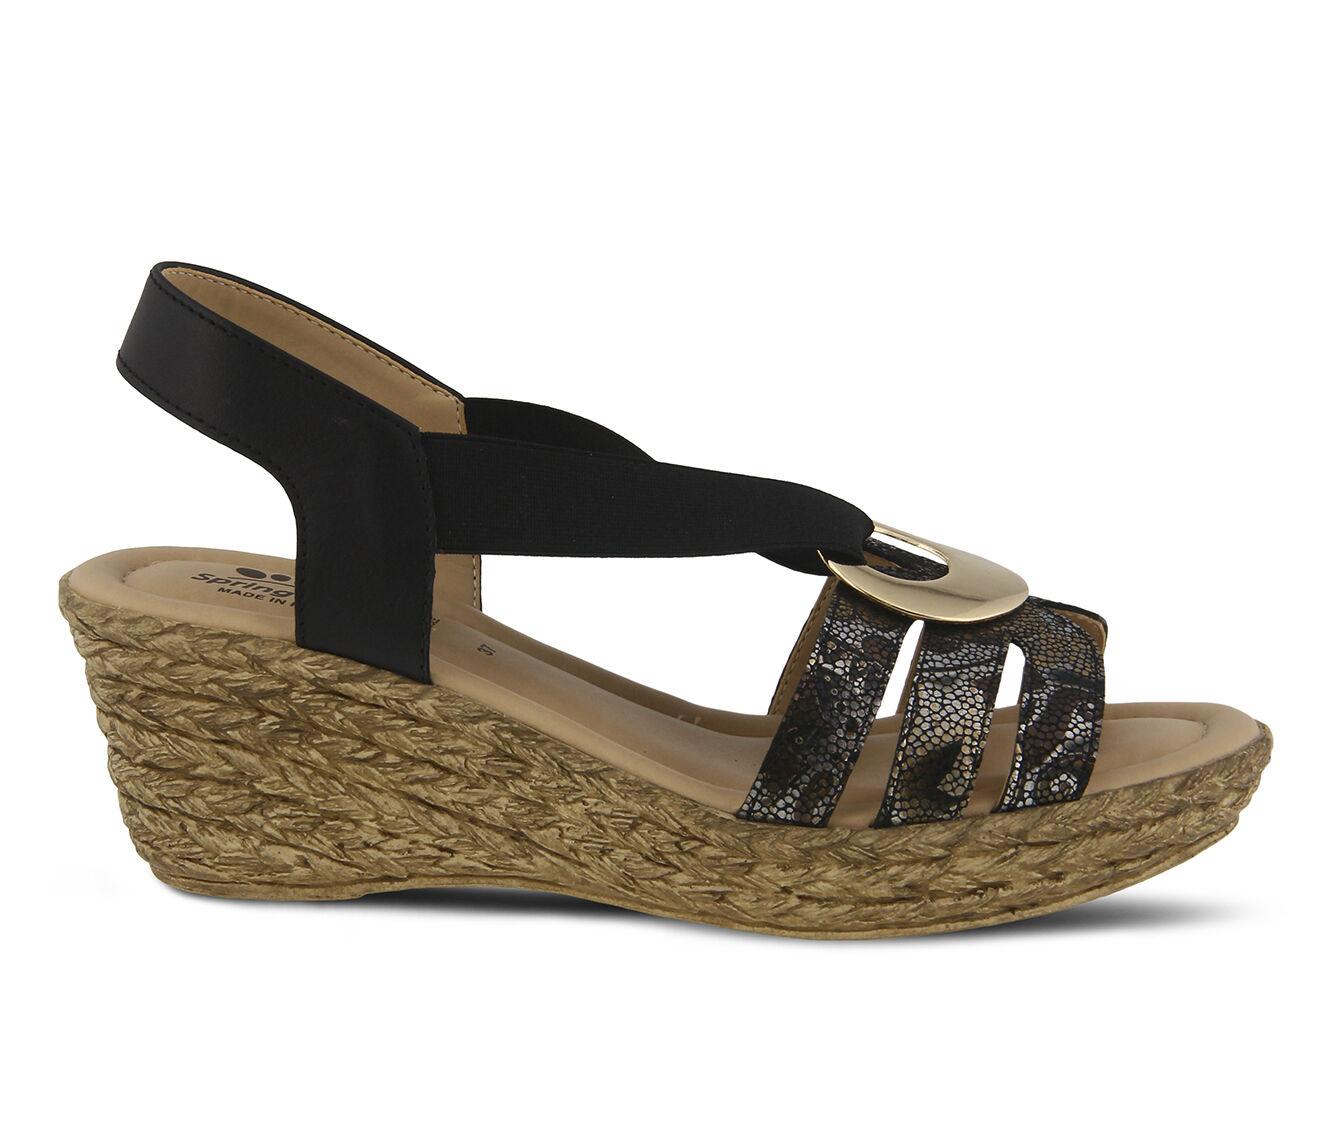 Quantity Assured Women's SPRING STEP Misi Dress Sandals Black Multi